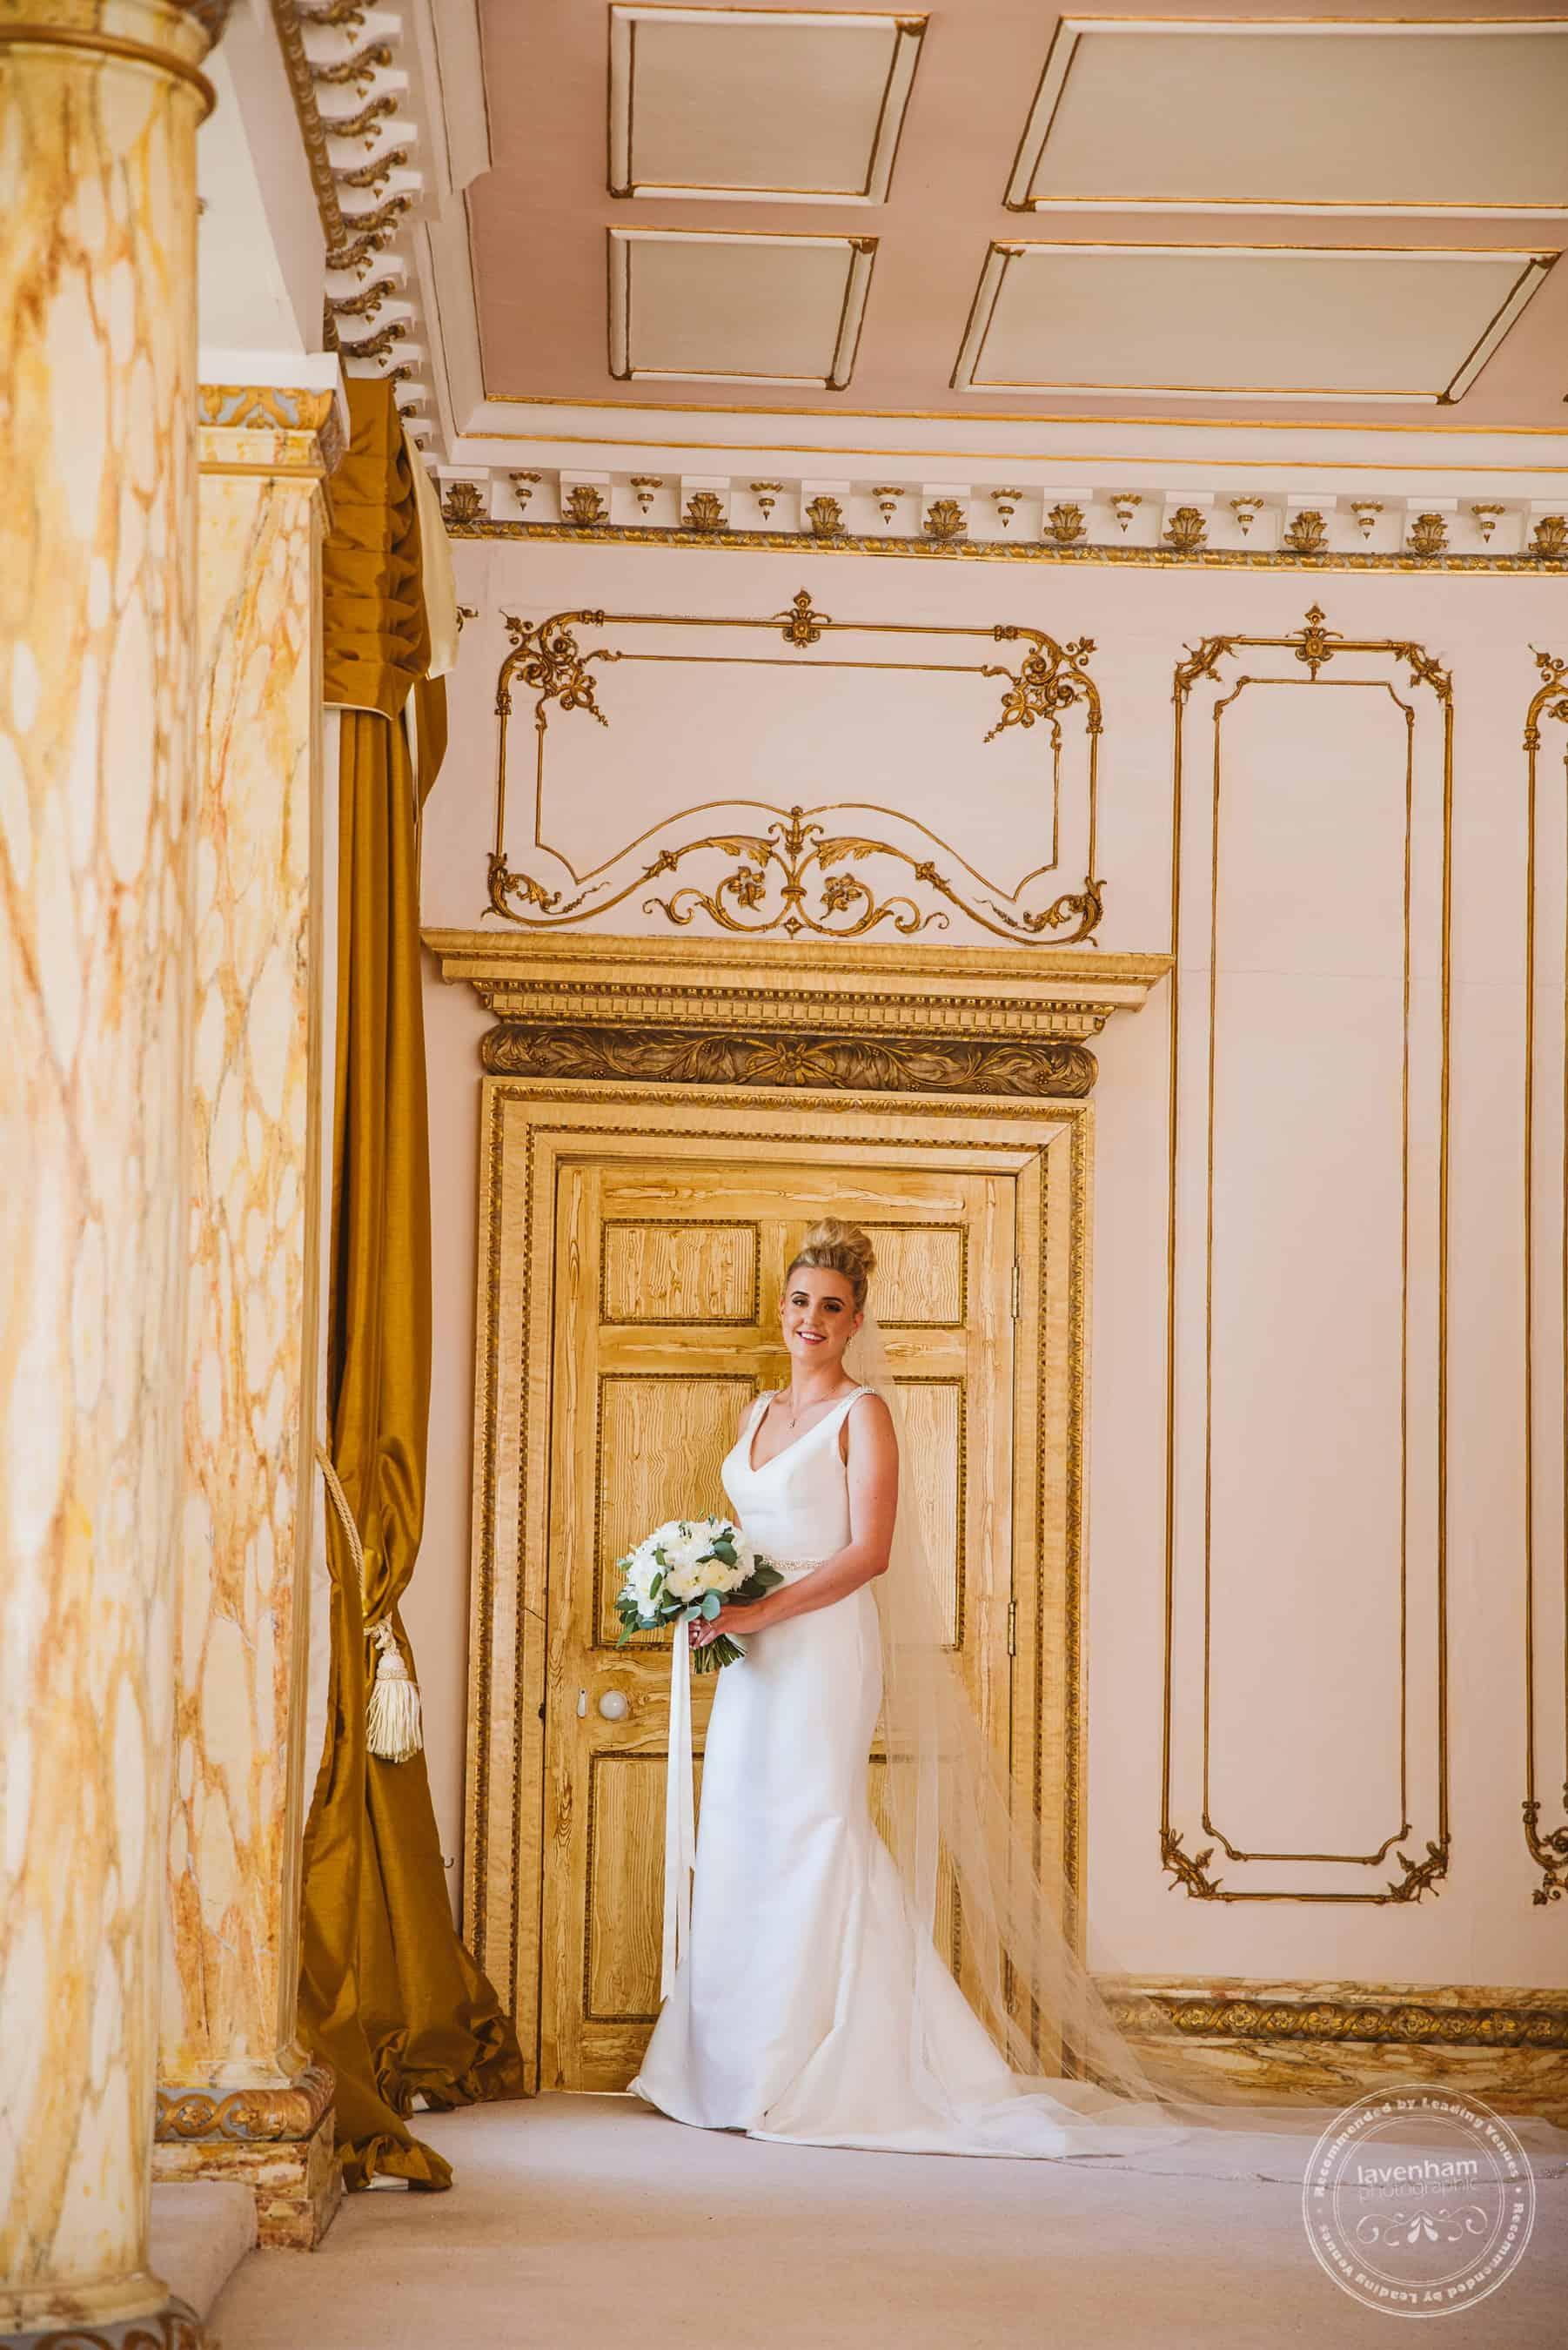 220618 Gosfield Hall Wedding Photography Lavenham Photographic 0029